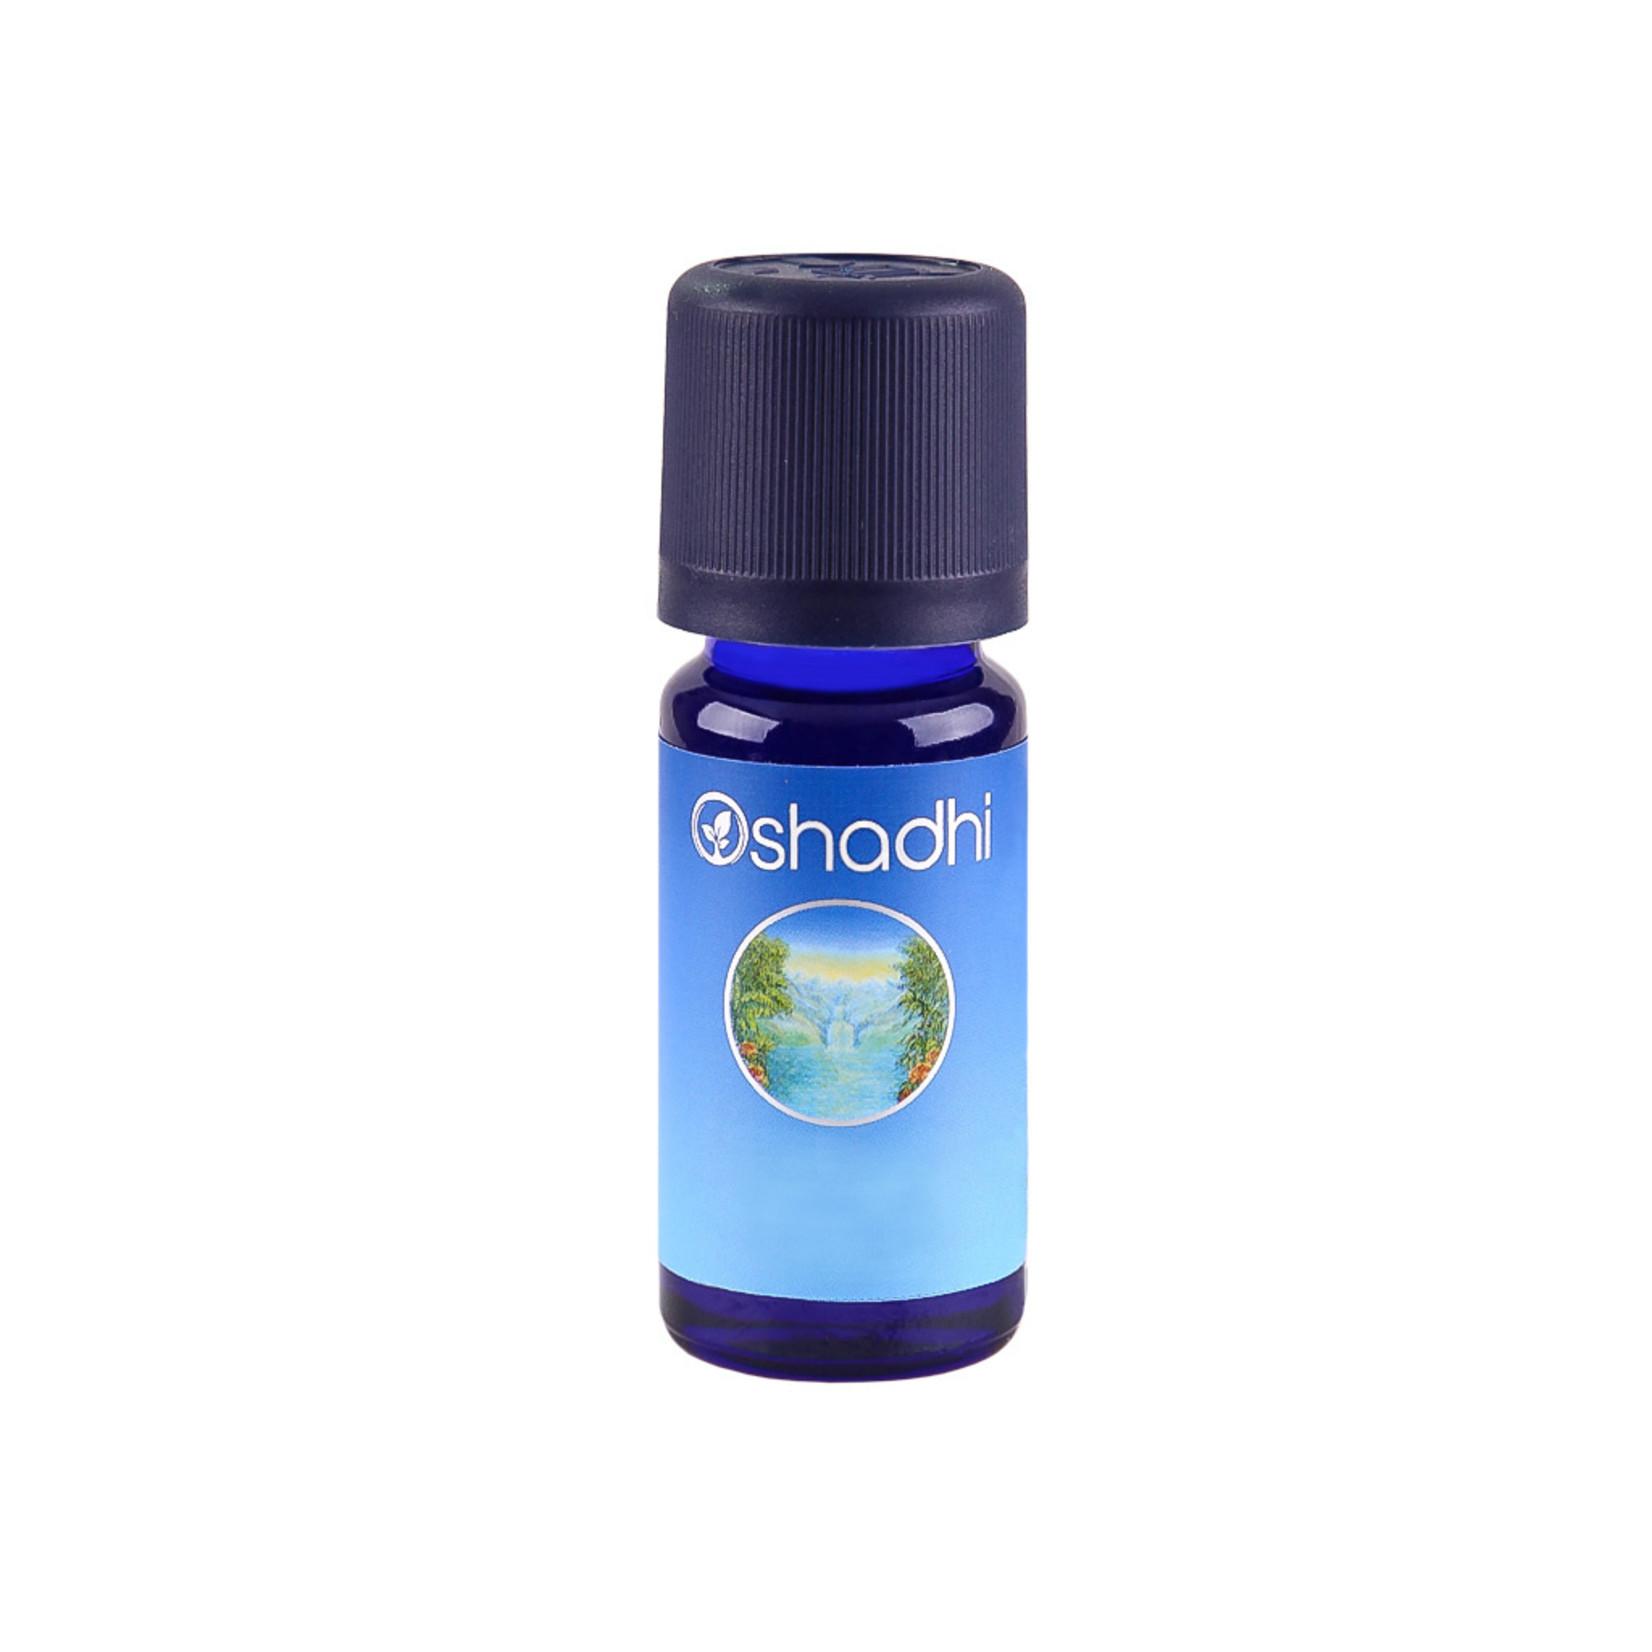 Oshadhi Patchouli essentiële olie Oshadhi - sterk aardend - 10ml